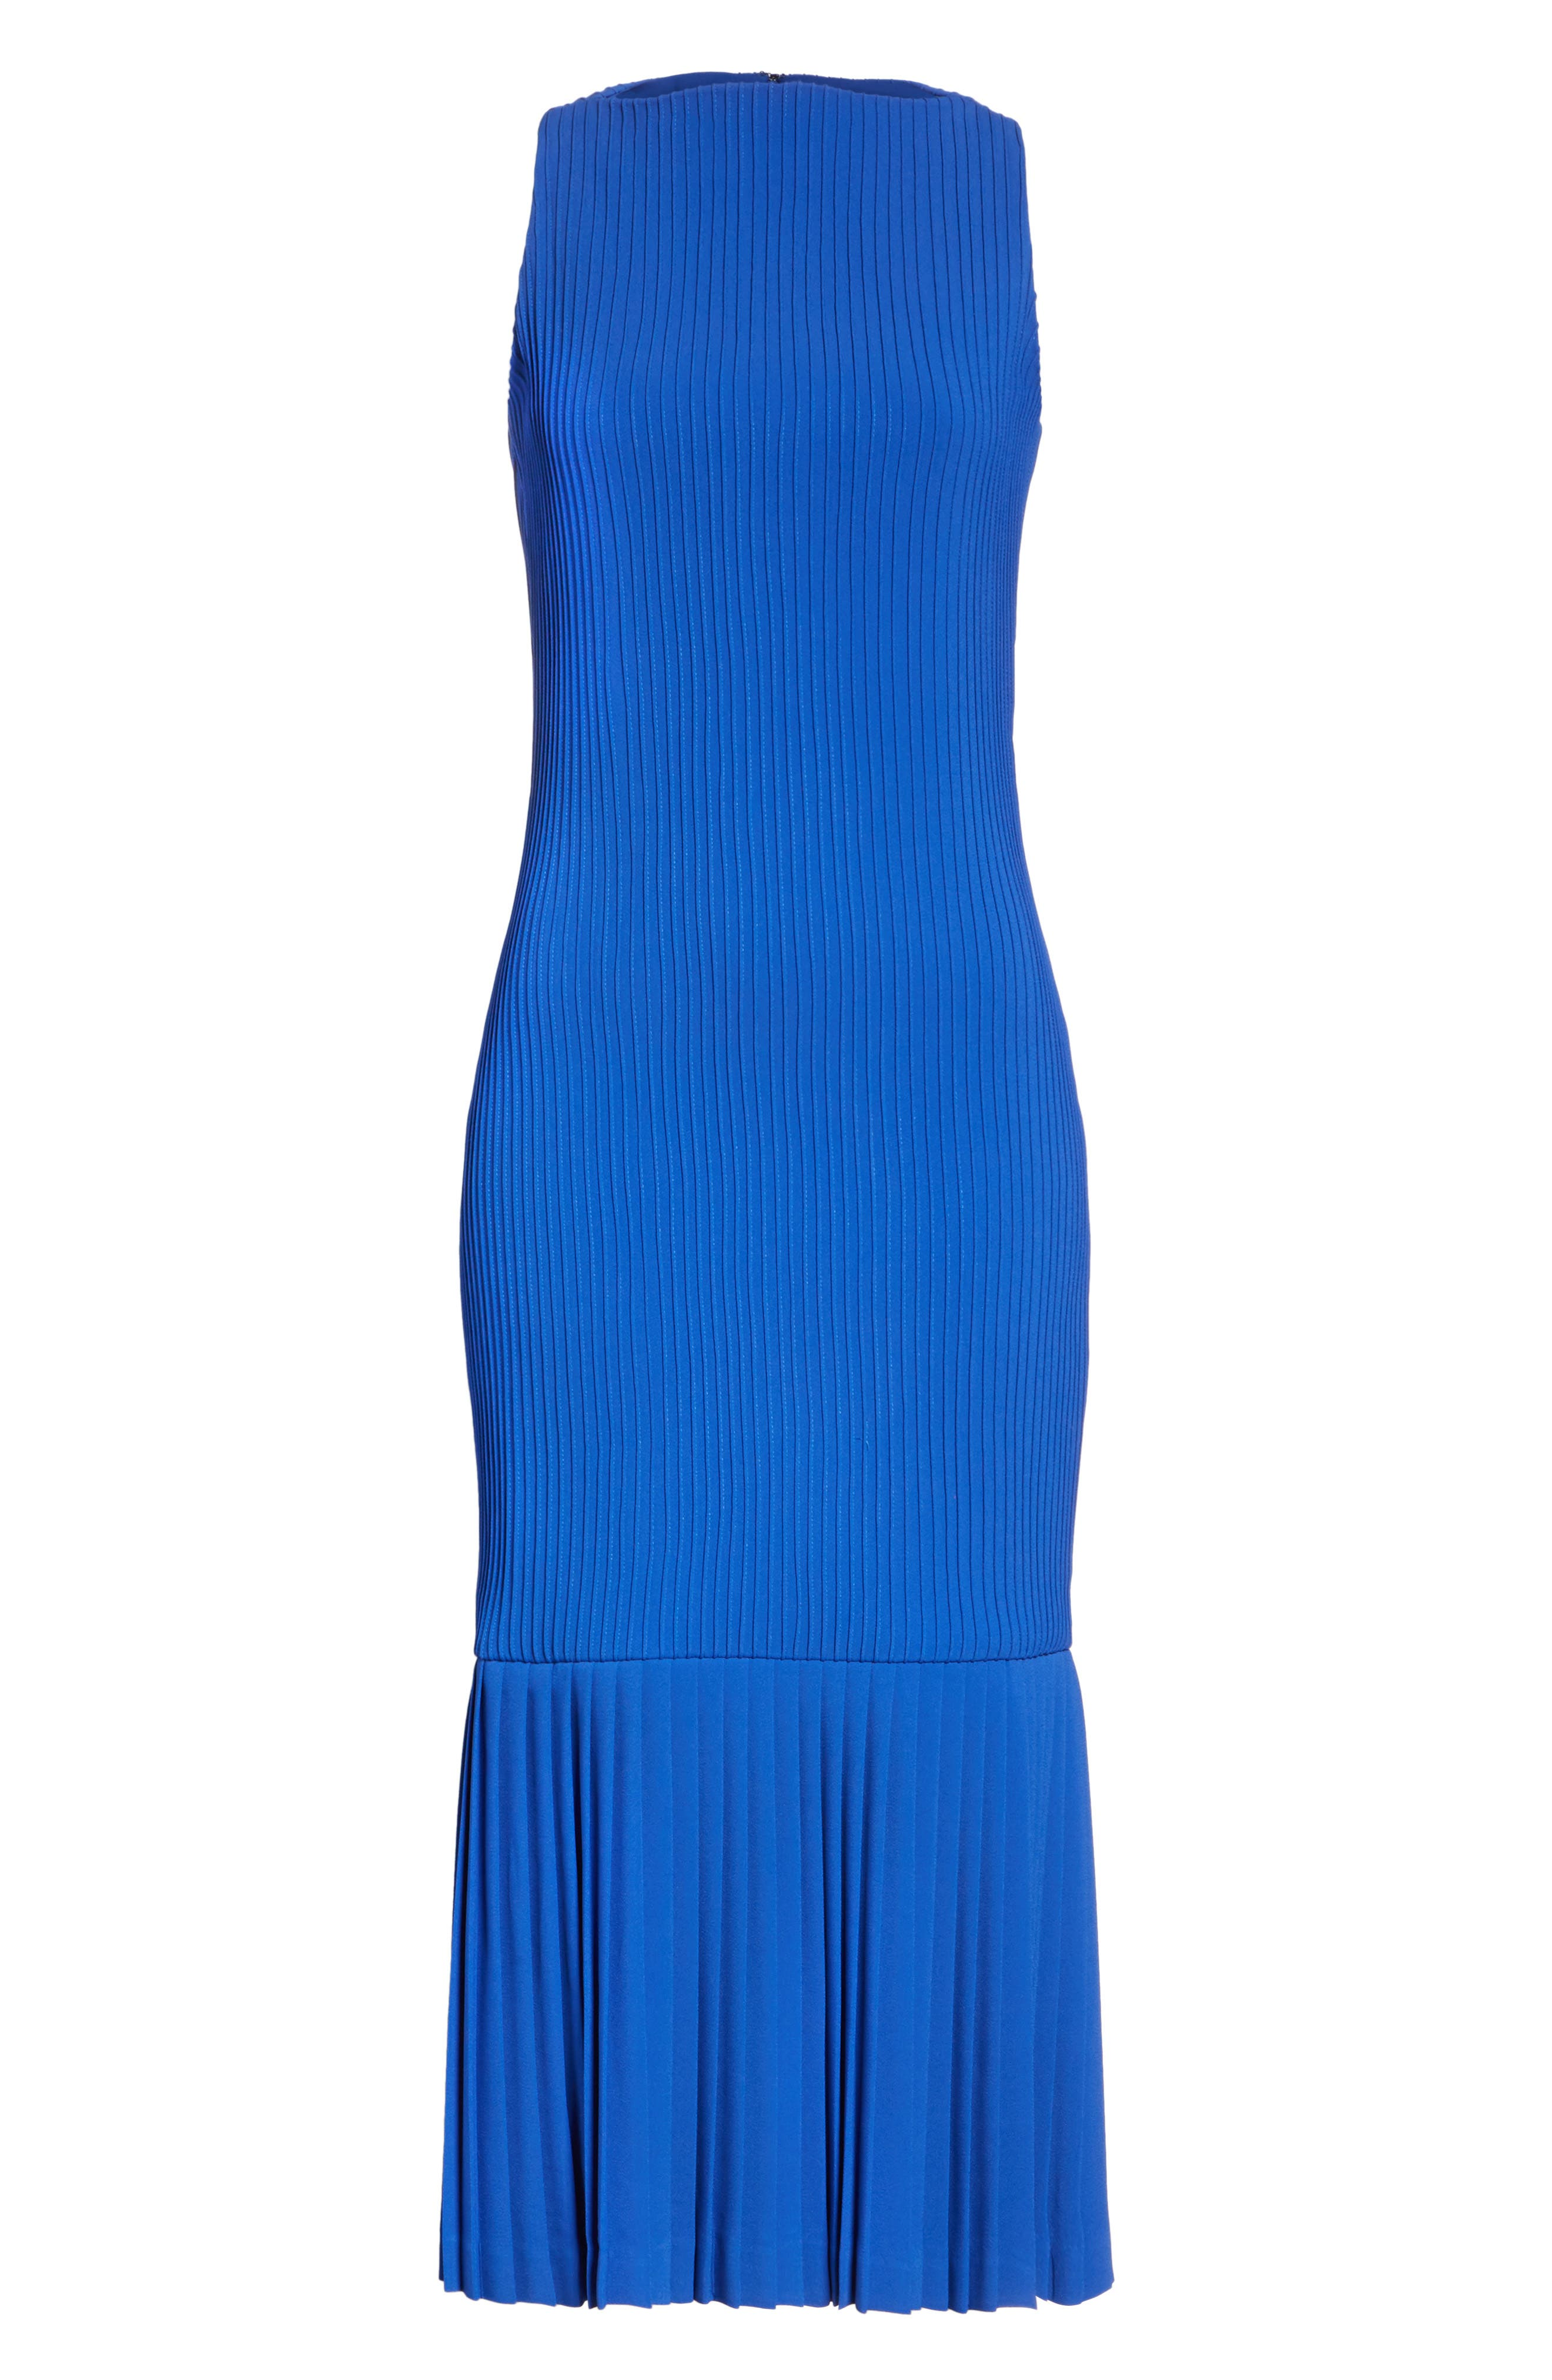 Pintuck Flare Hem Dress,                             Alternate thumbnail 6, color,                             Cobalt